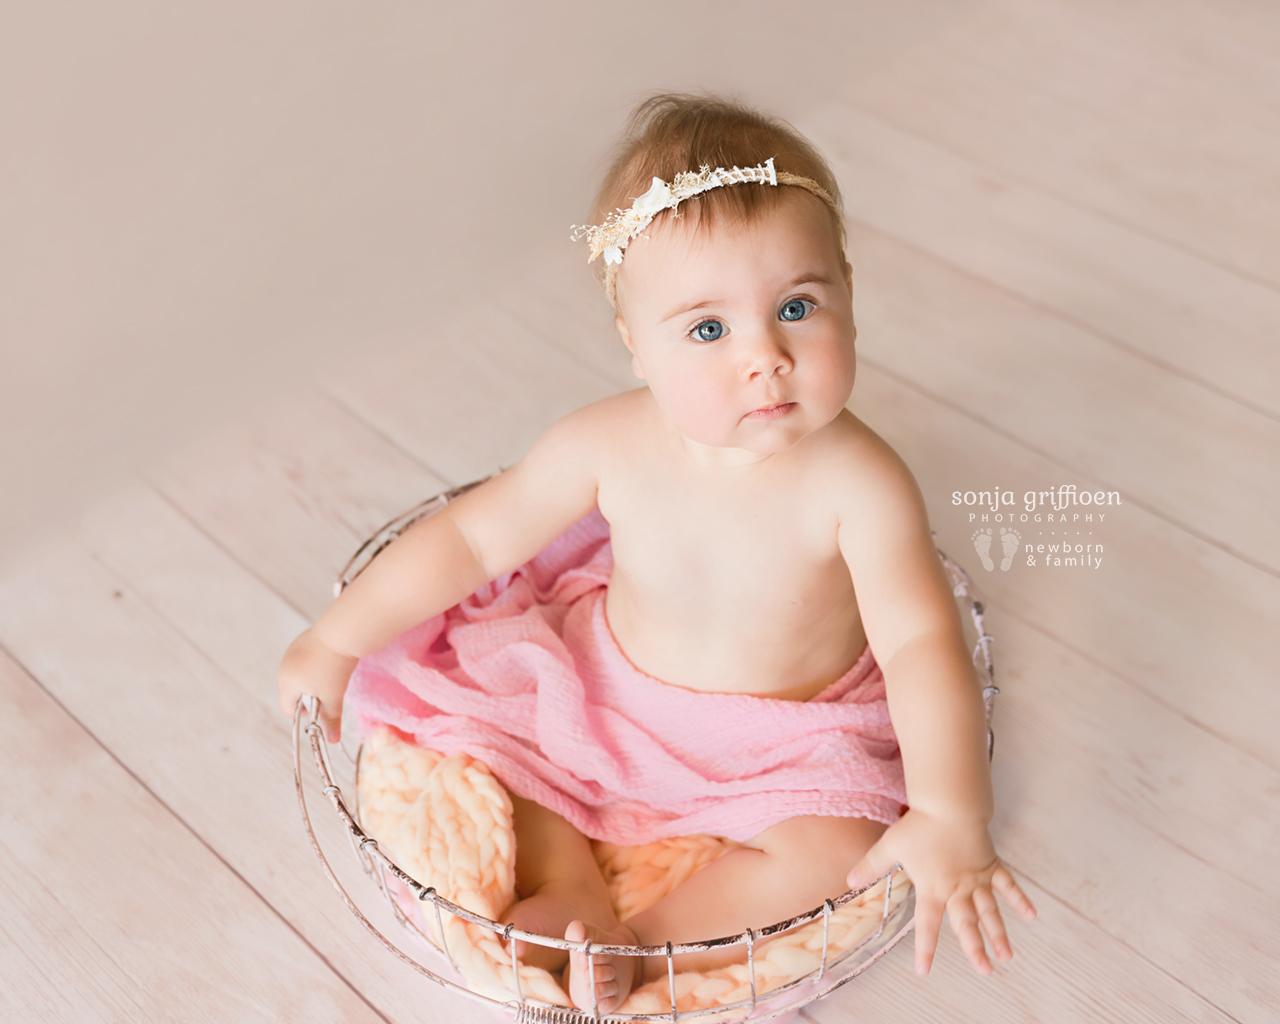 Thalia-Milestone-Brisbane-Newborn-Photographer-Sonja-Griffioen-14.jpg